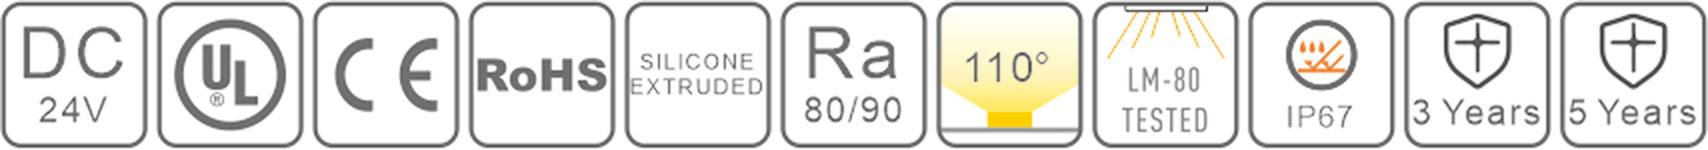 0410 led silicone neon flex-certification